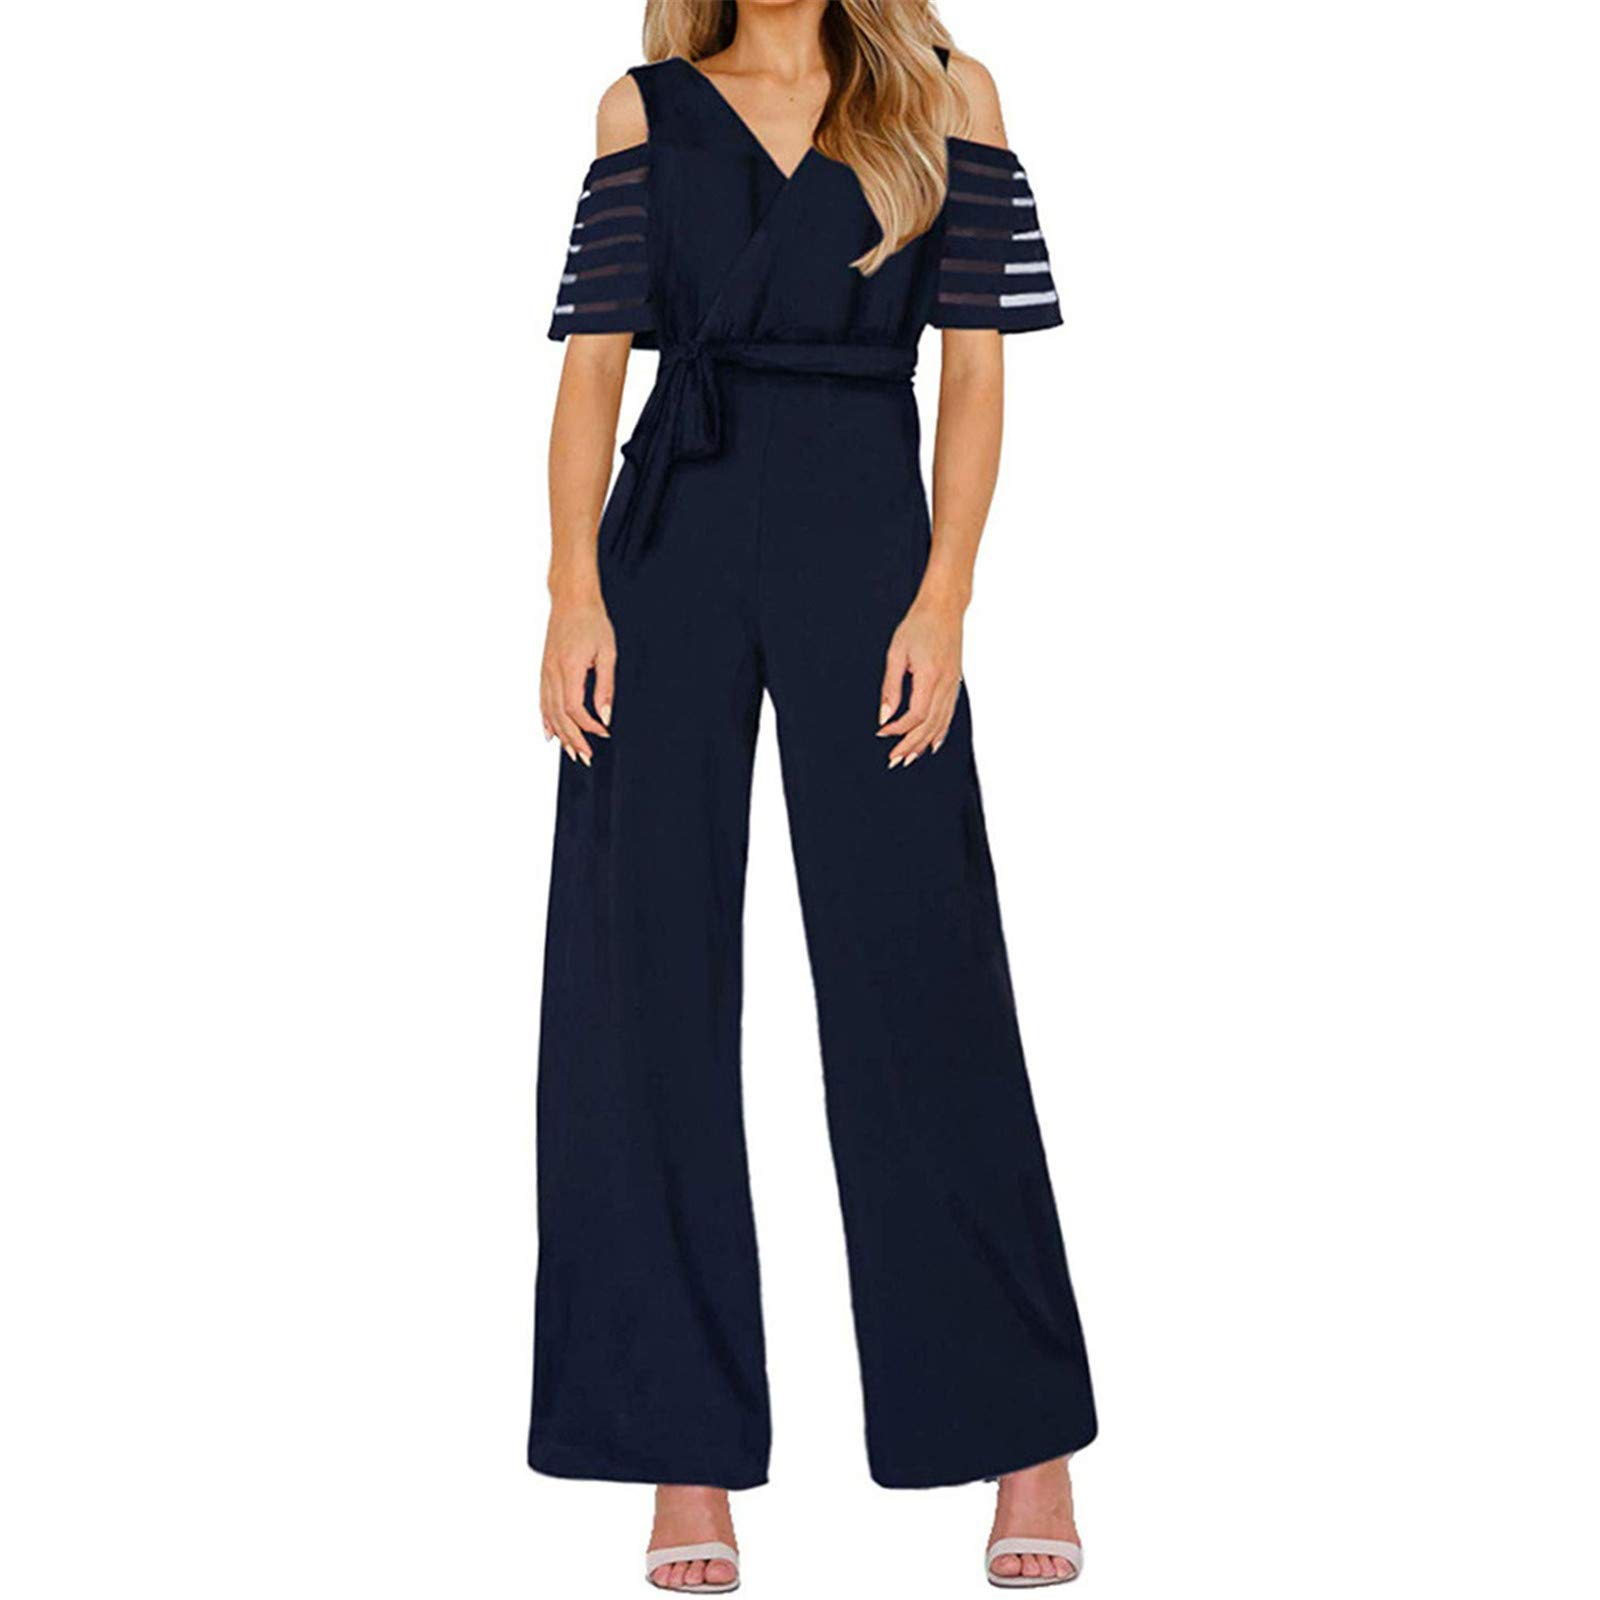 Thenxin Office Lady Jumpsuit V Neck Cold Shoulder High Waist Wide Leg Long Romper with Belt(Navy,S)